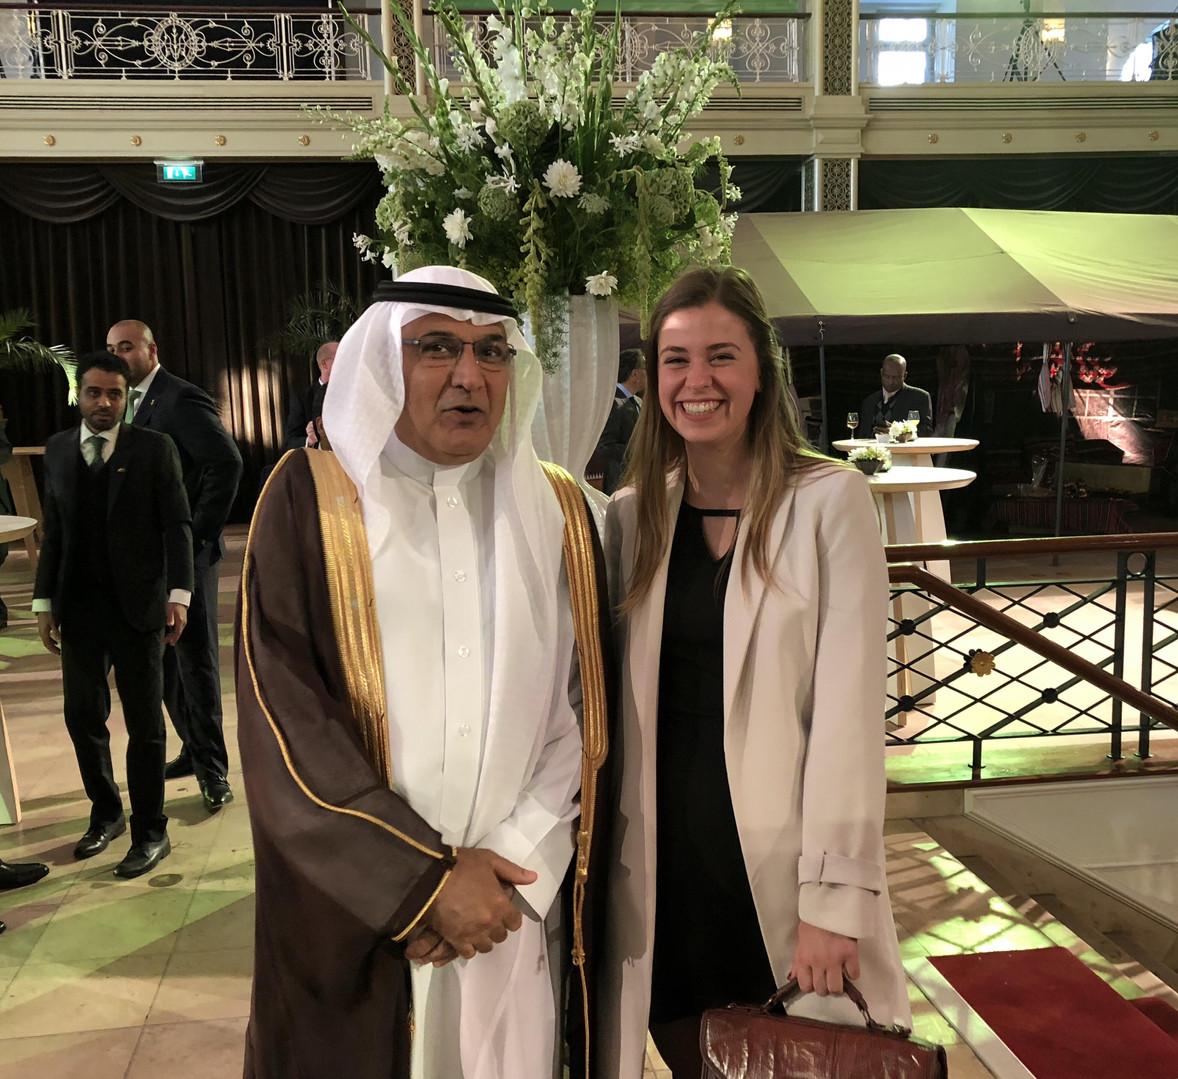 H.E. Abdulaziz Abdullah Abdulaziz Abohaimed ambassador of Saudi Arabia to the Netherlands together with Stefi Gubbels at the Kurhaus in The Hague